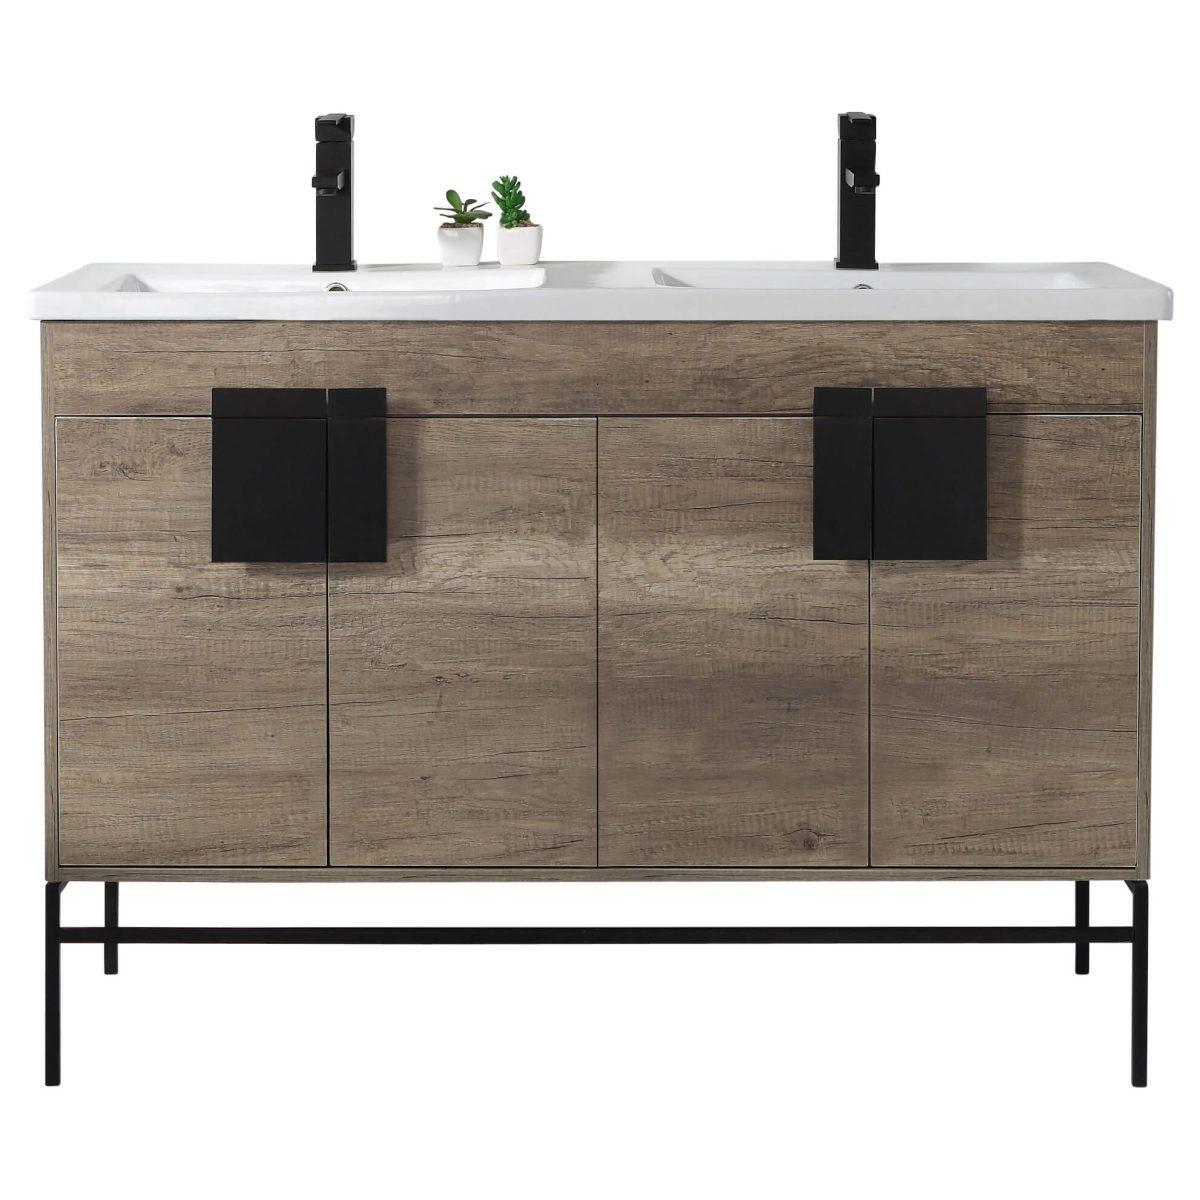 "Shawbridge 48"" Modern Double Bathroom Vanity  Shadow Gray with Black Hardware"